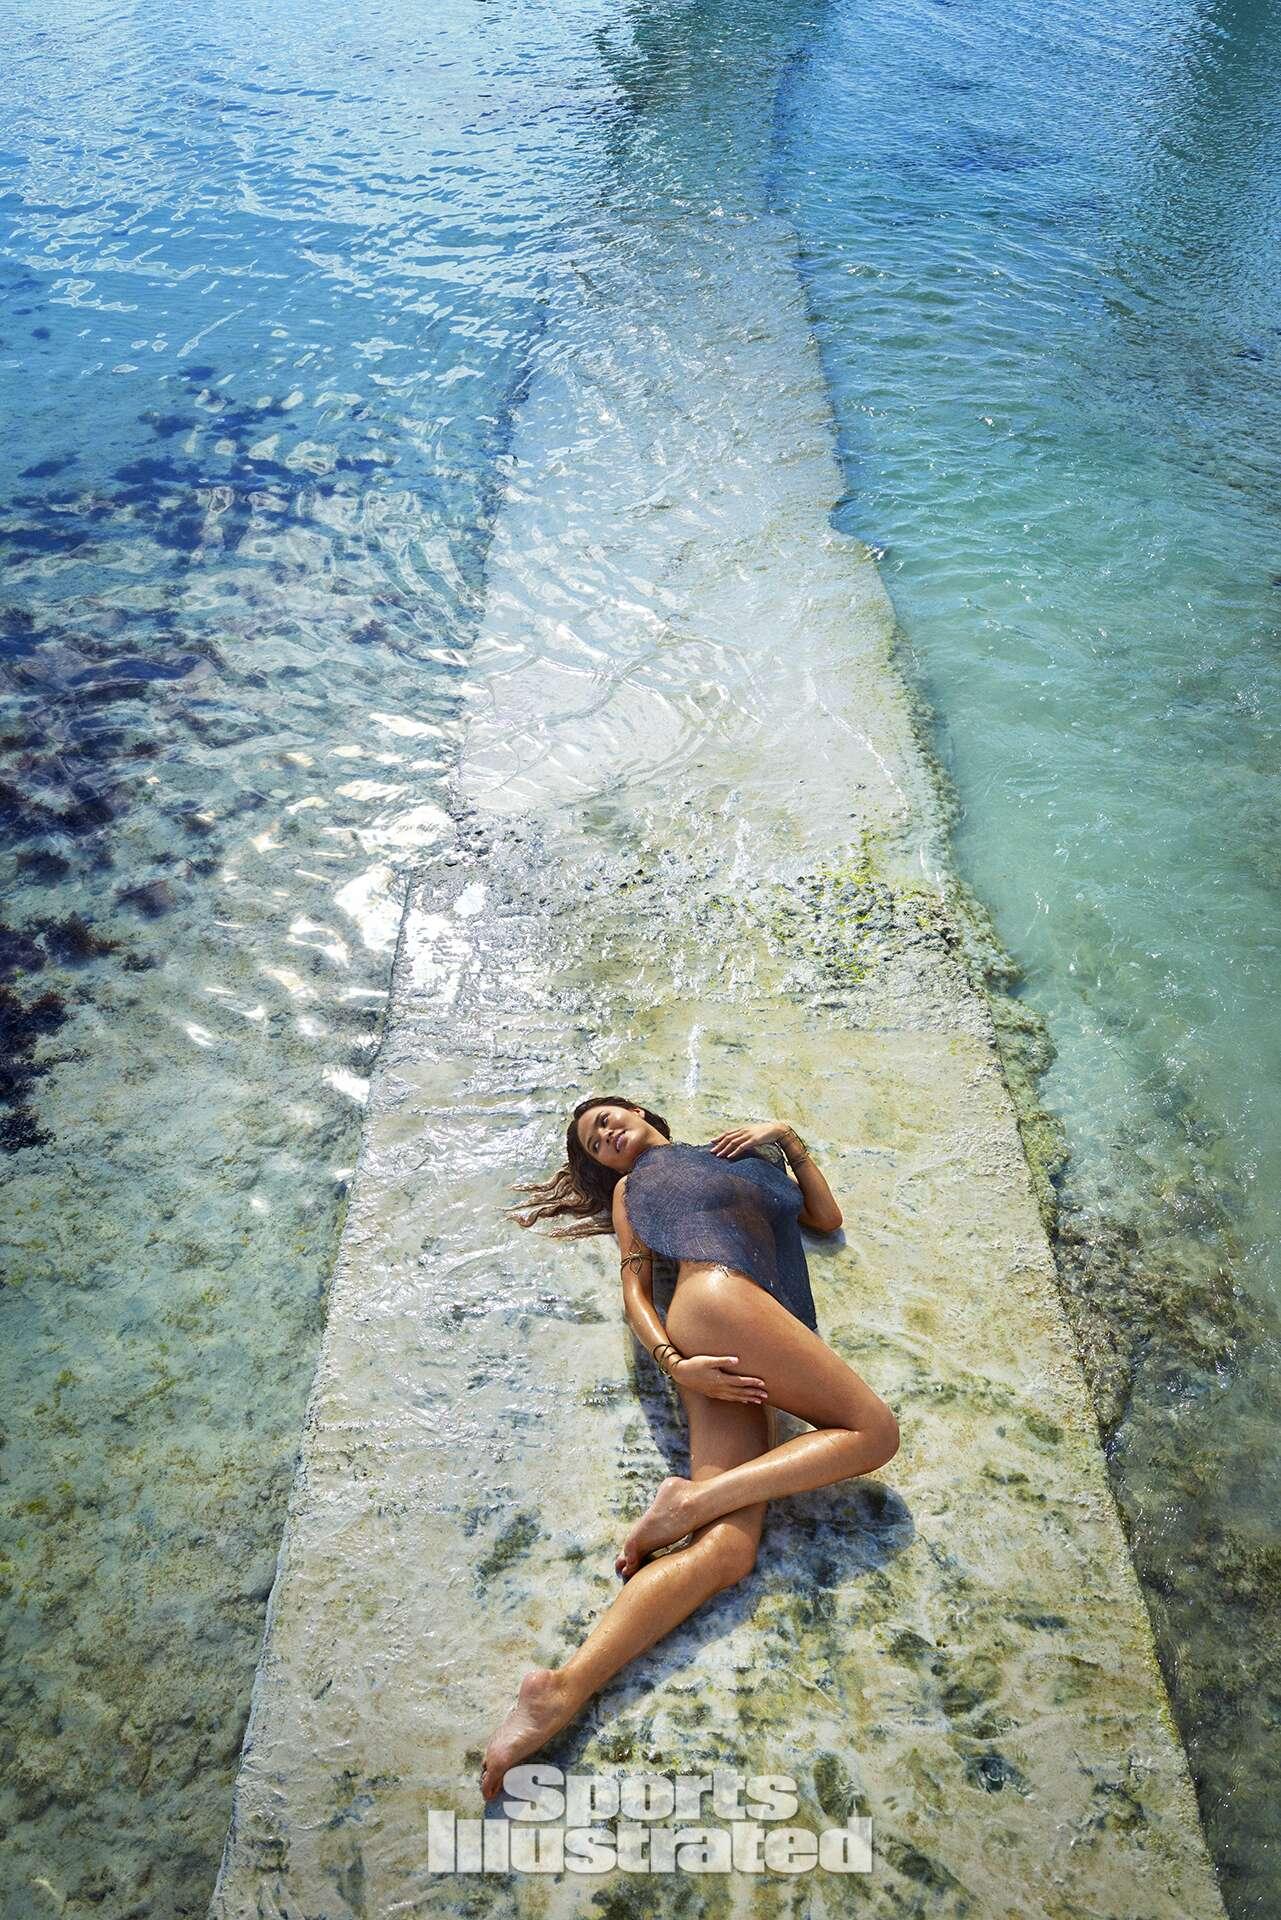 Chrissy Teigen was photographed by Ruven Afanador in Zanzibar.